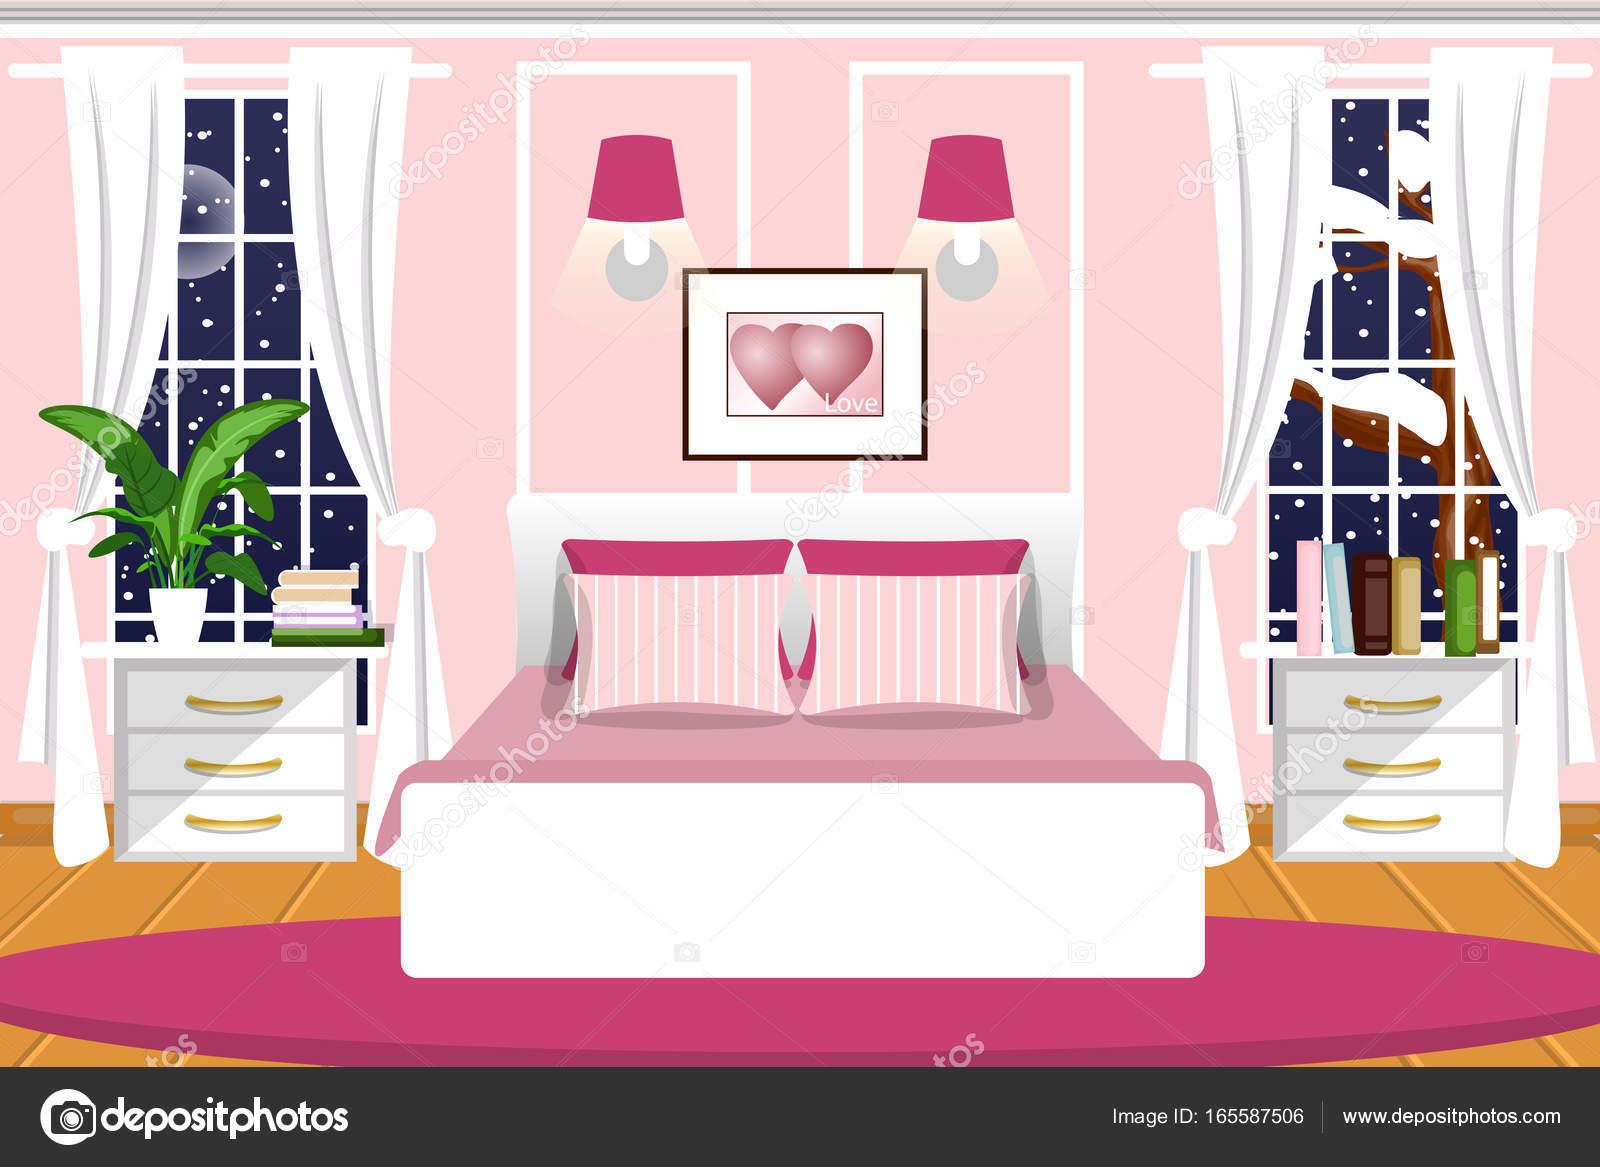 The Interior Of The Bedroom Vector Cartoon Night Landscape Outside The Window Stock Vector C Molnia26 165587506